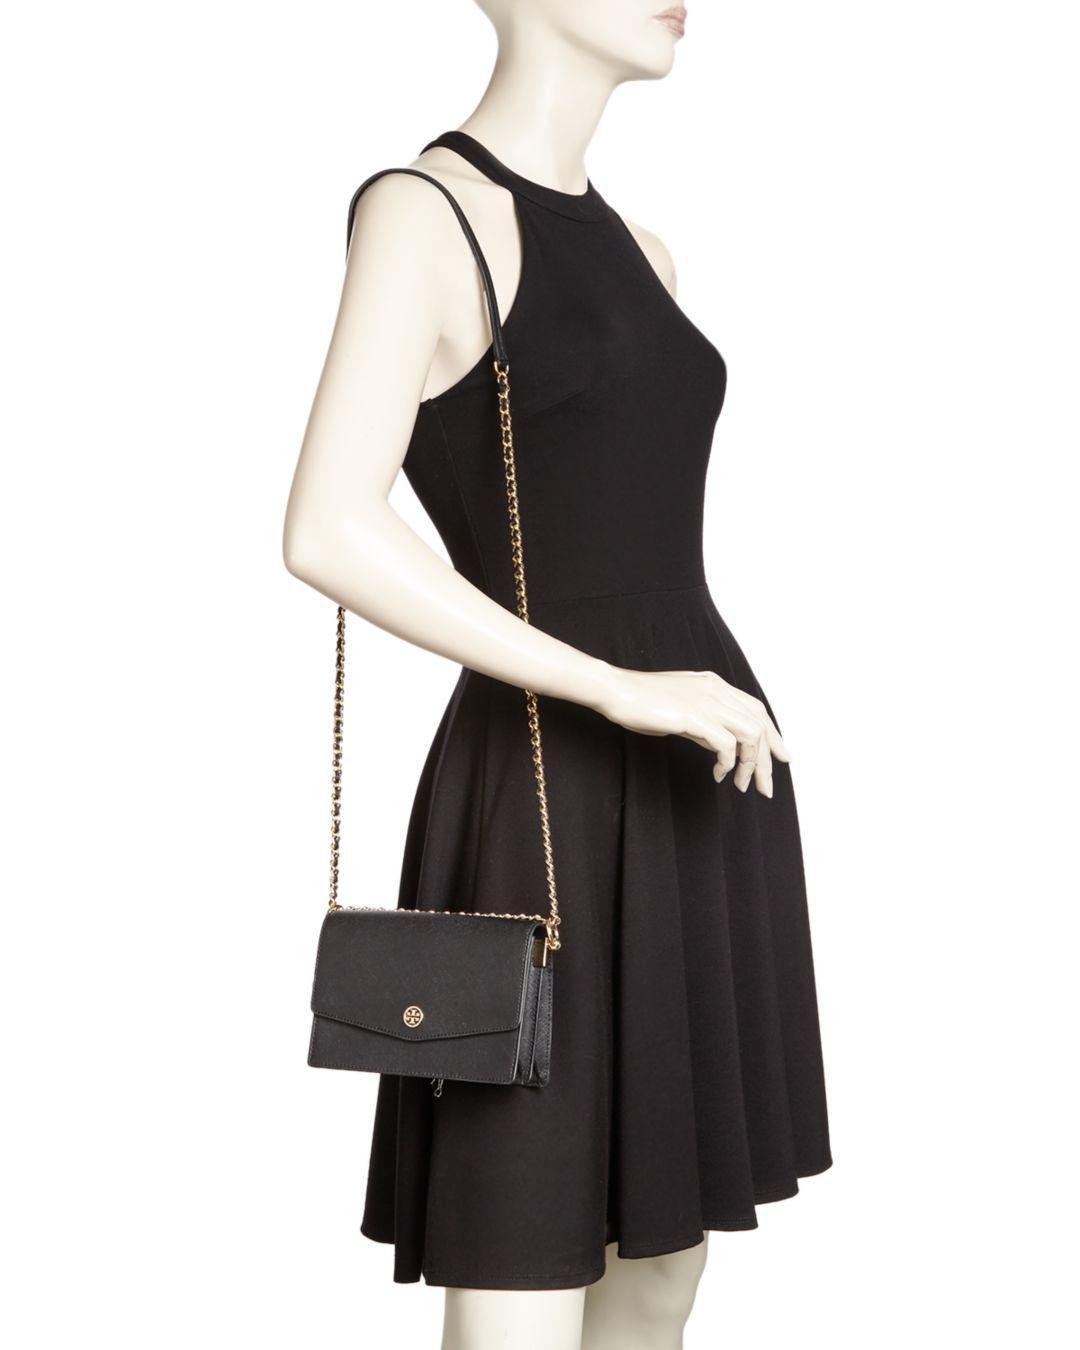 c650d71c9df1 Tory Burch Robinson Mini Leather Convertible Shoulder Bag in Black - Lyst